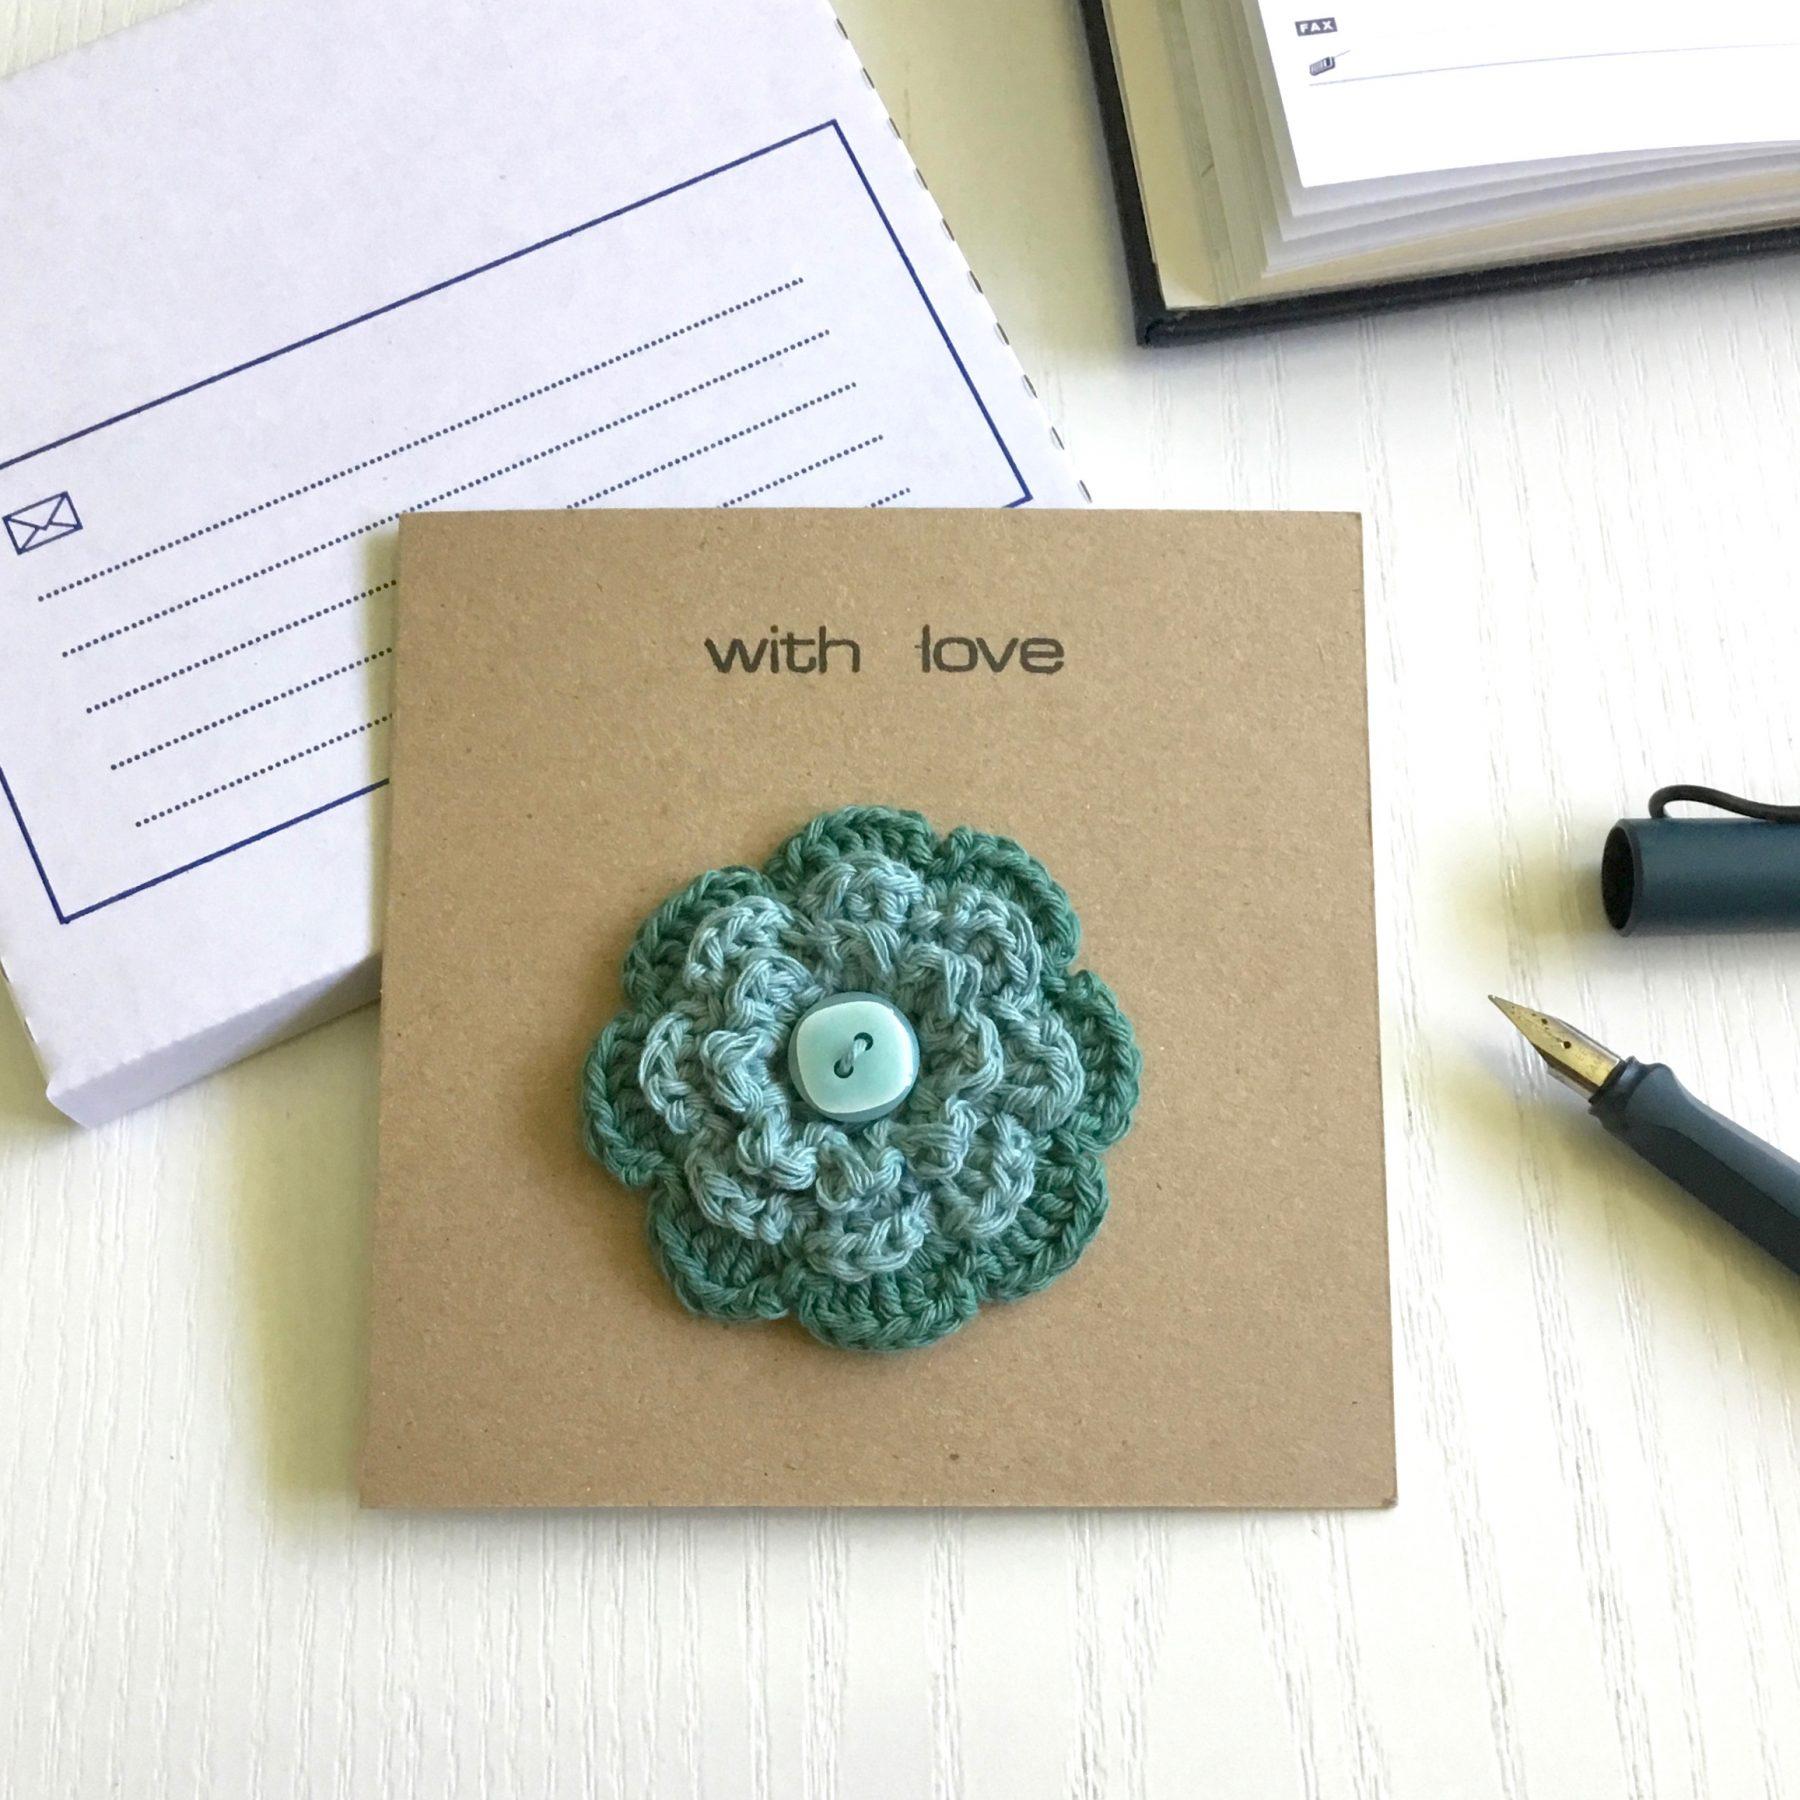 Greetings Card with Flower Brooch